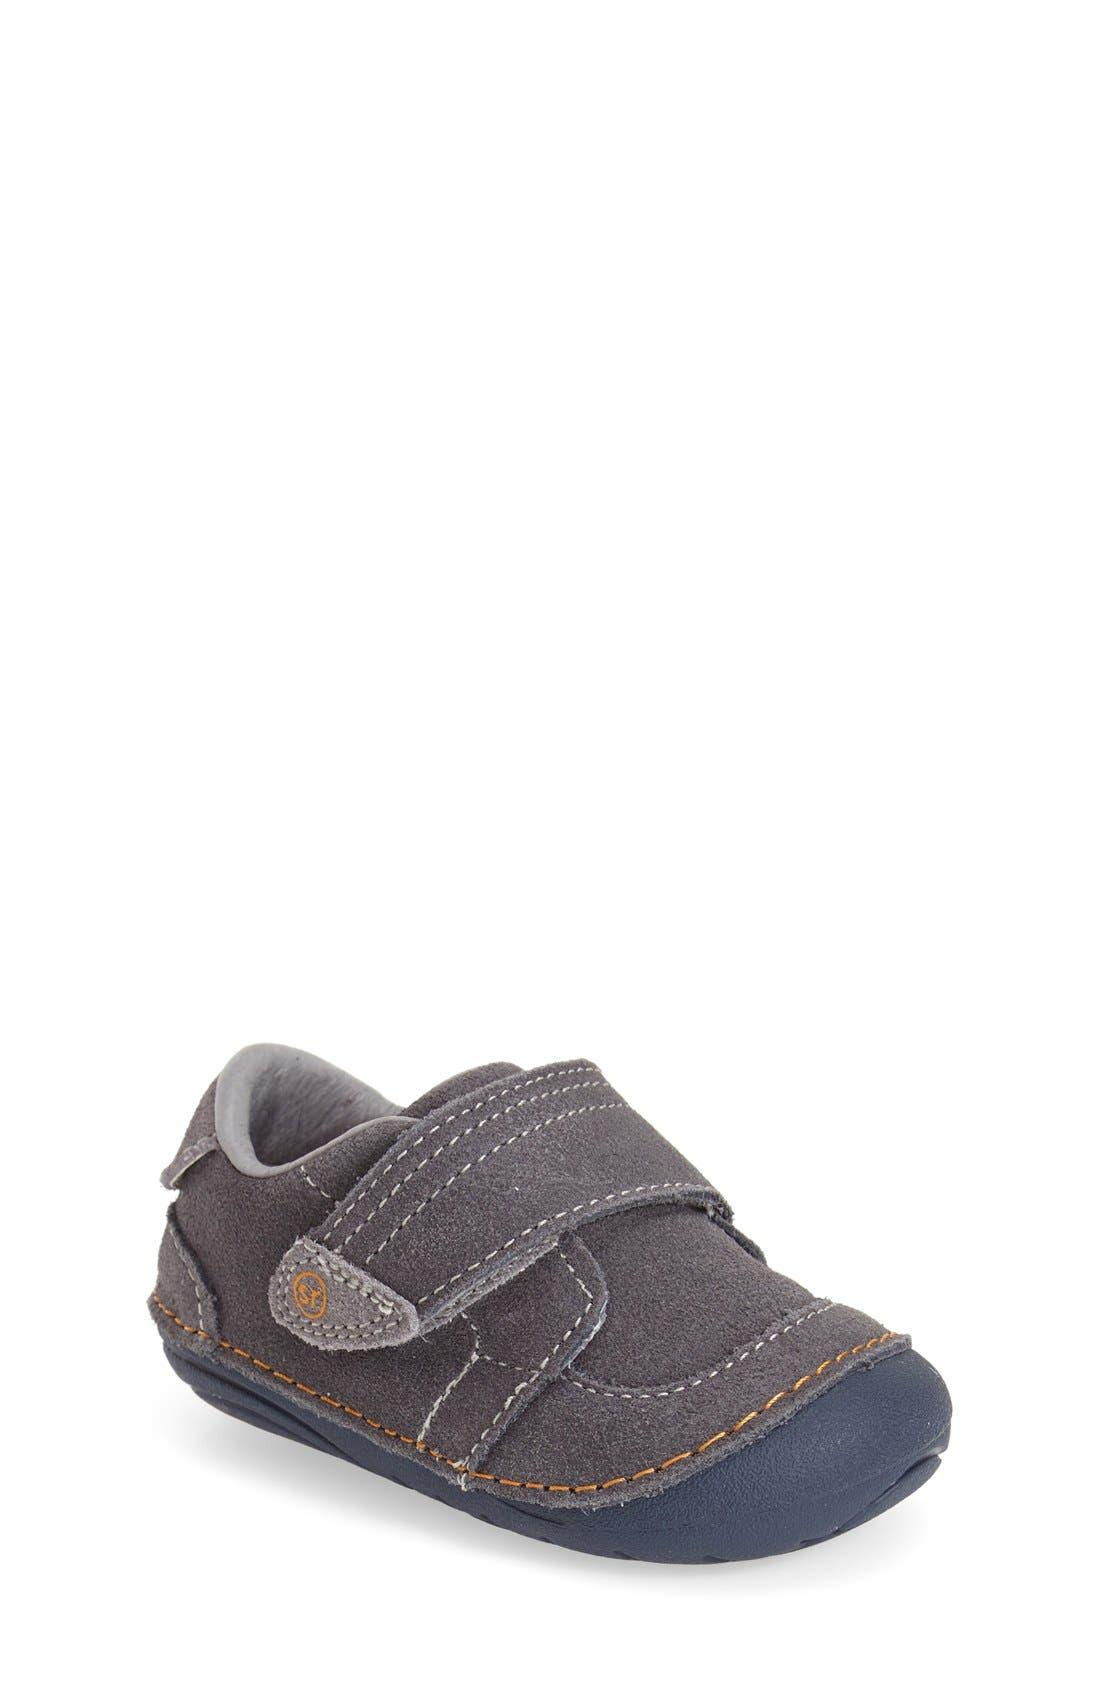 Soft Motion Kellen Sneaker,                         Main,                         color, GREY